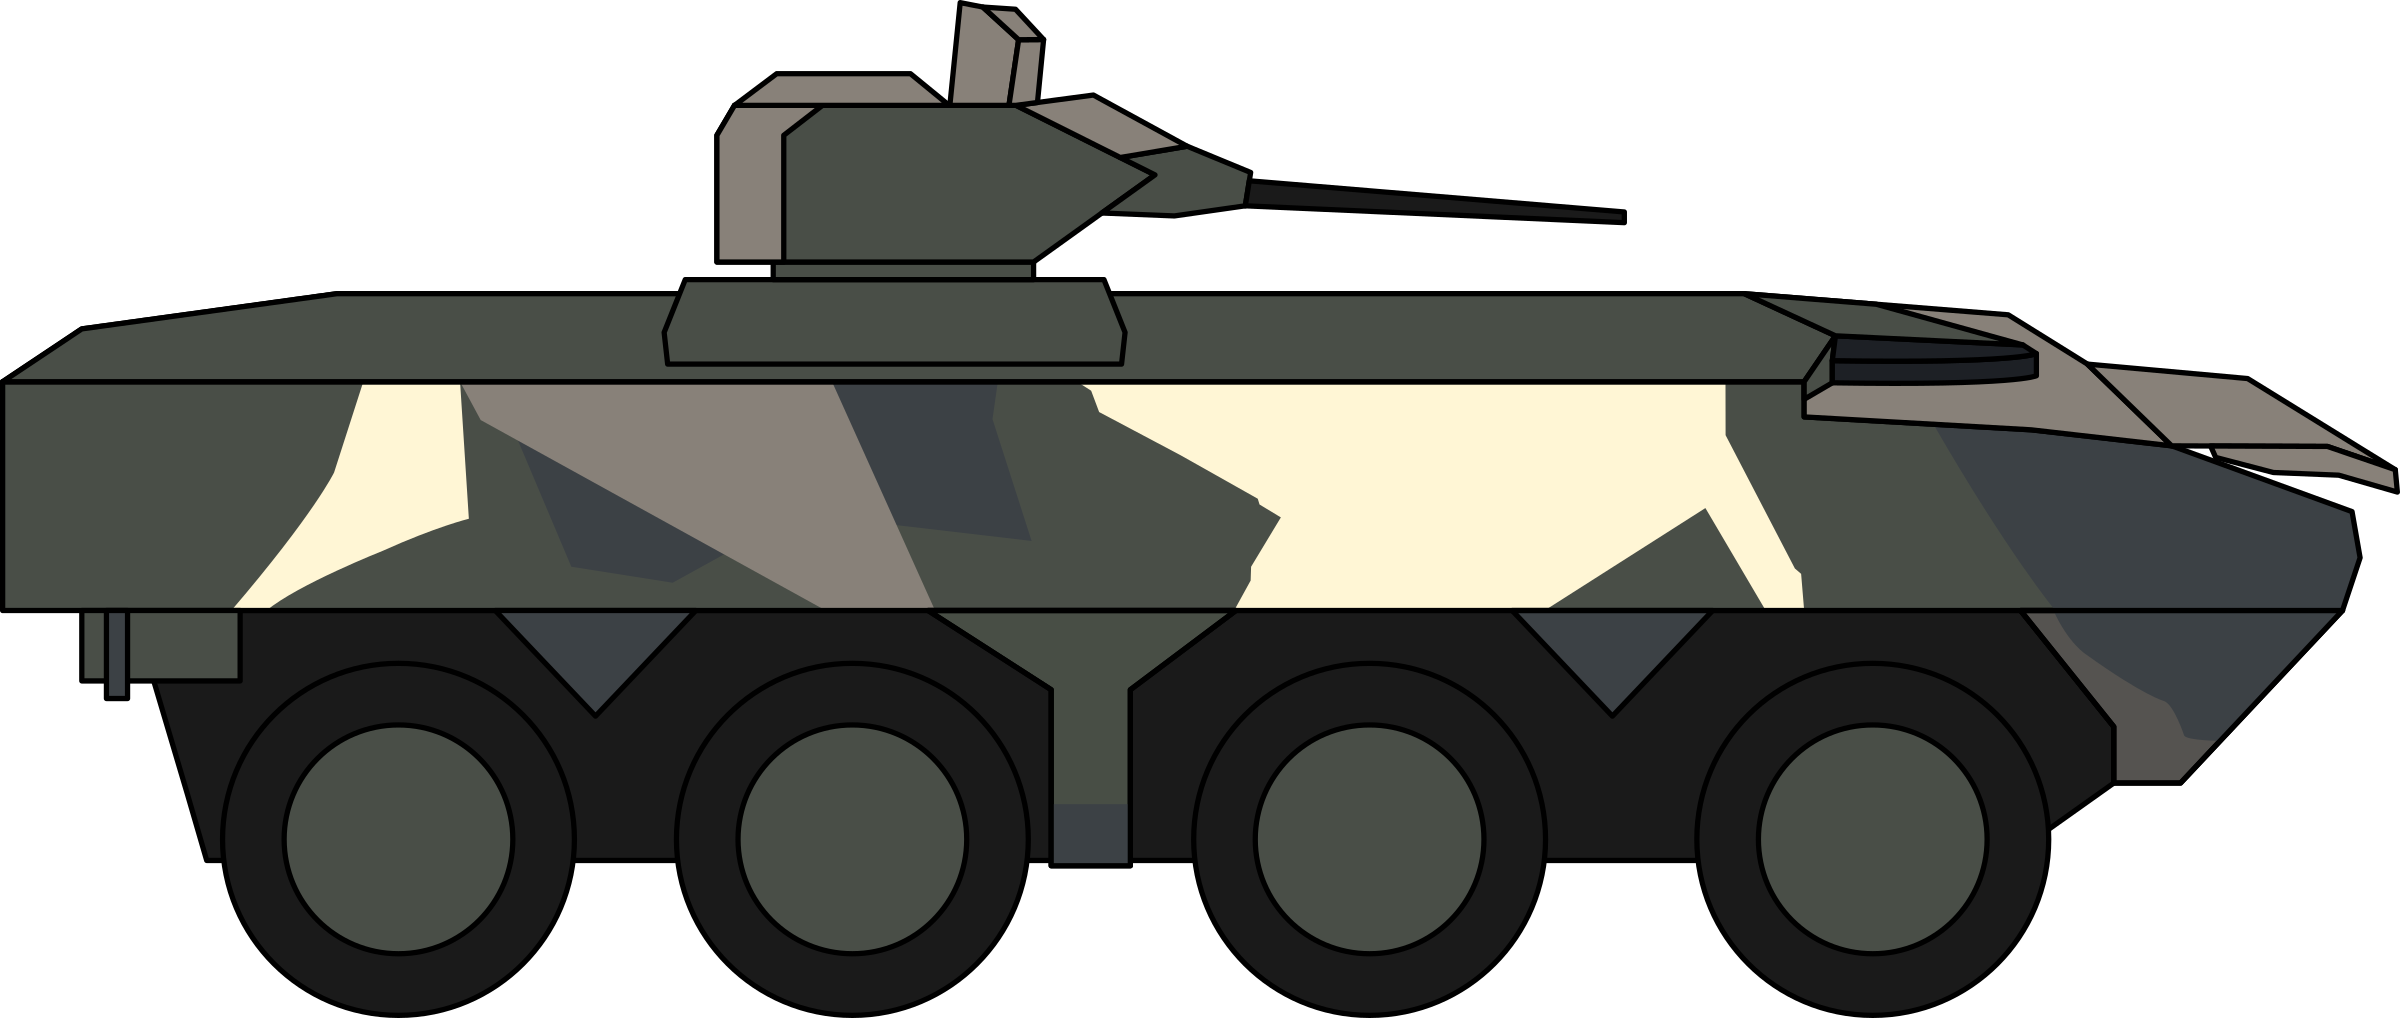 Military clipart turret. Deftech av big image